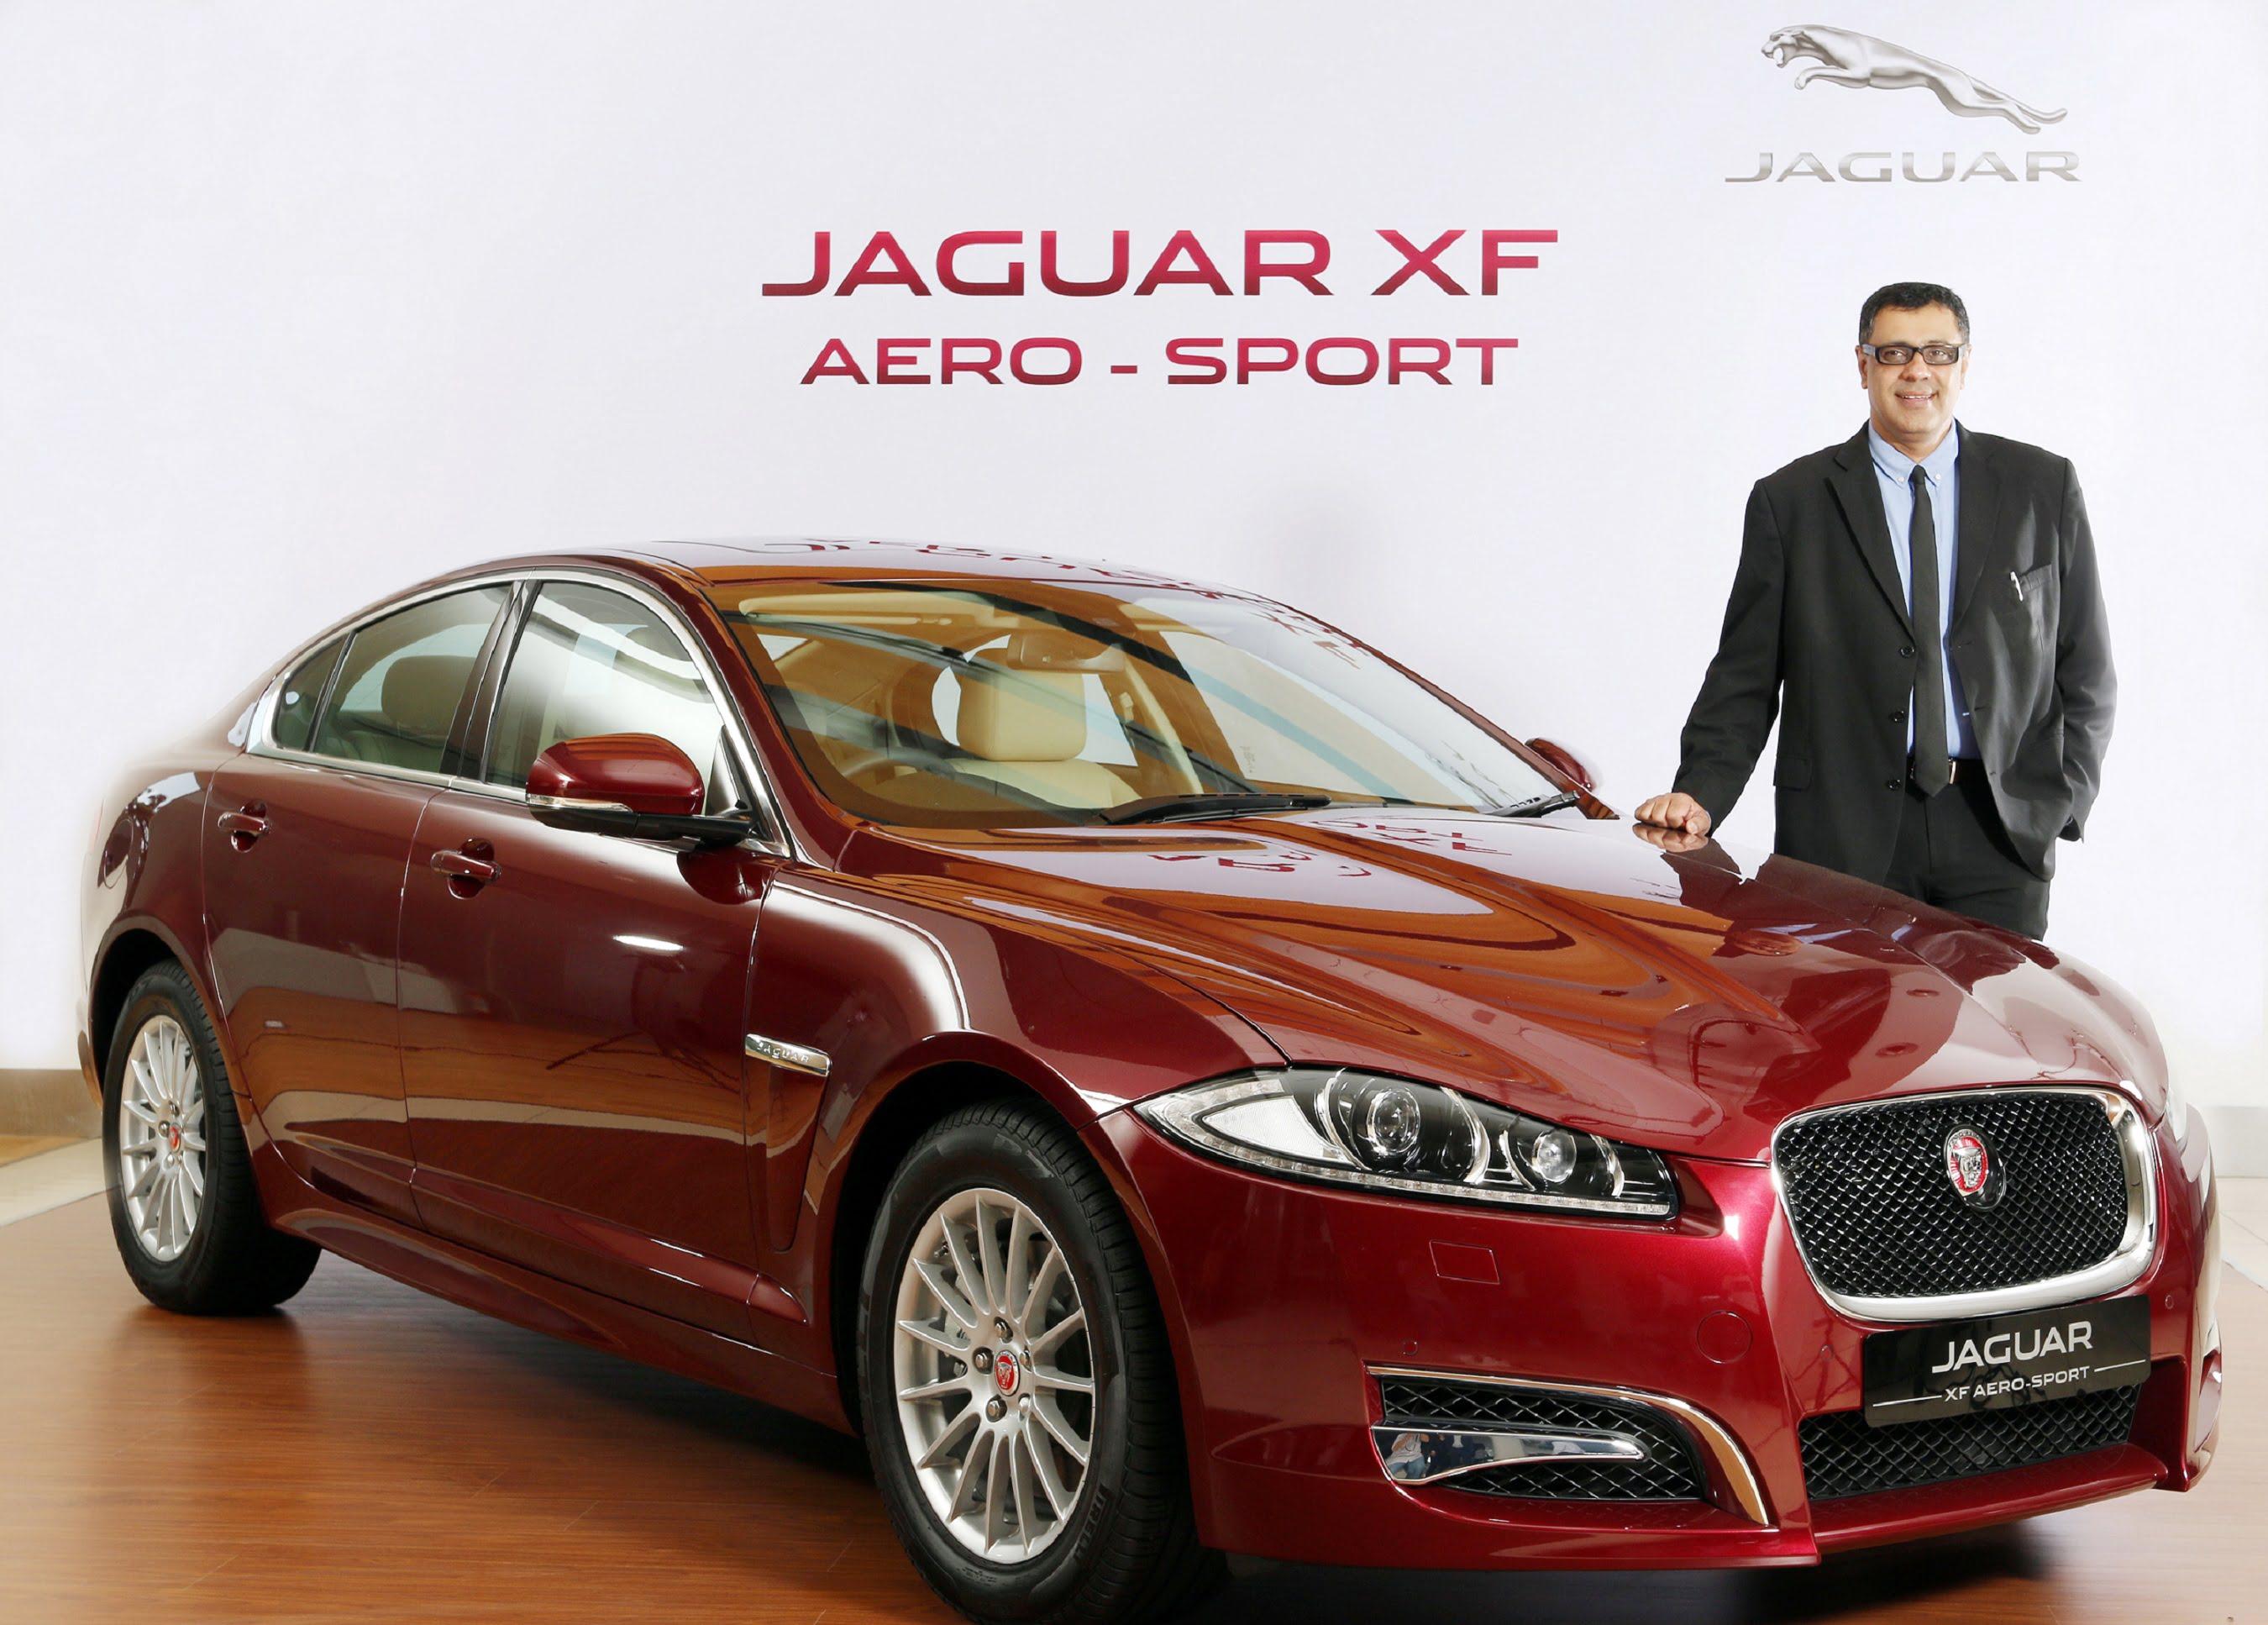 Jaguar Xf New Price >> Jaguar XF Aero Sport India Price, Specification, Features